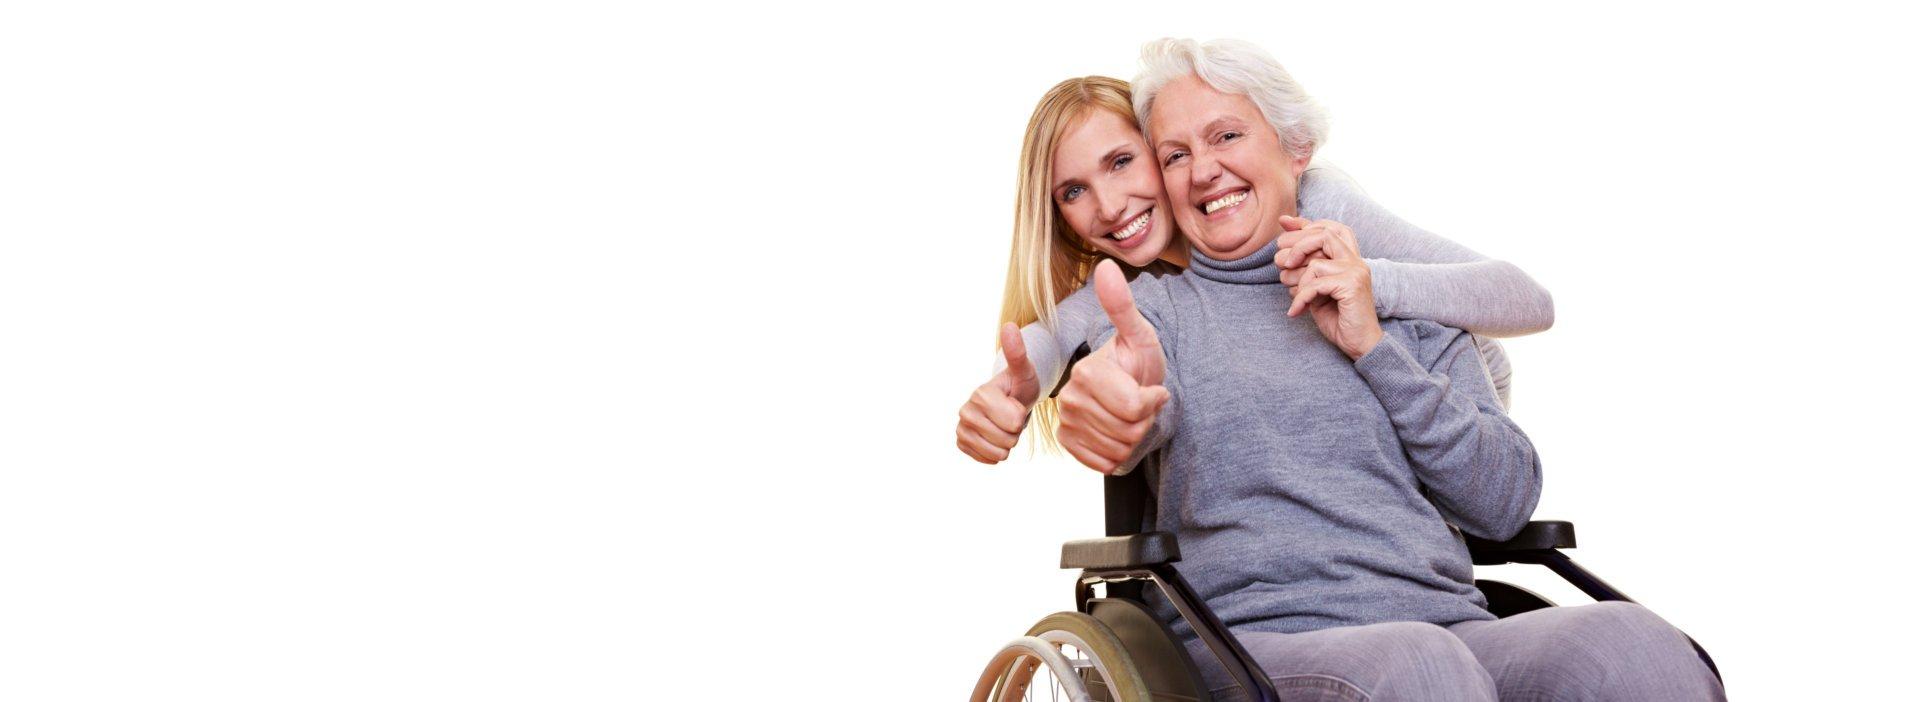 woman hugging an elderly woman